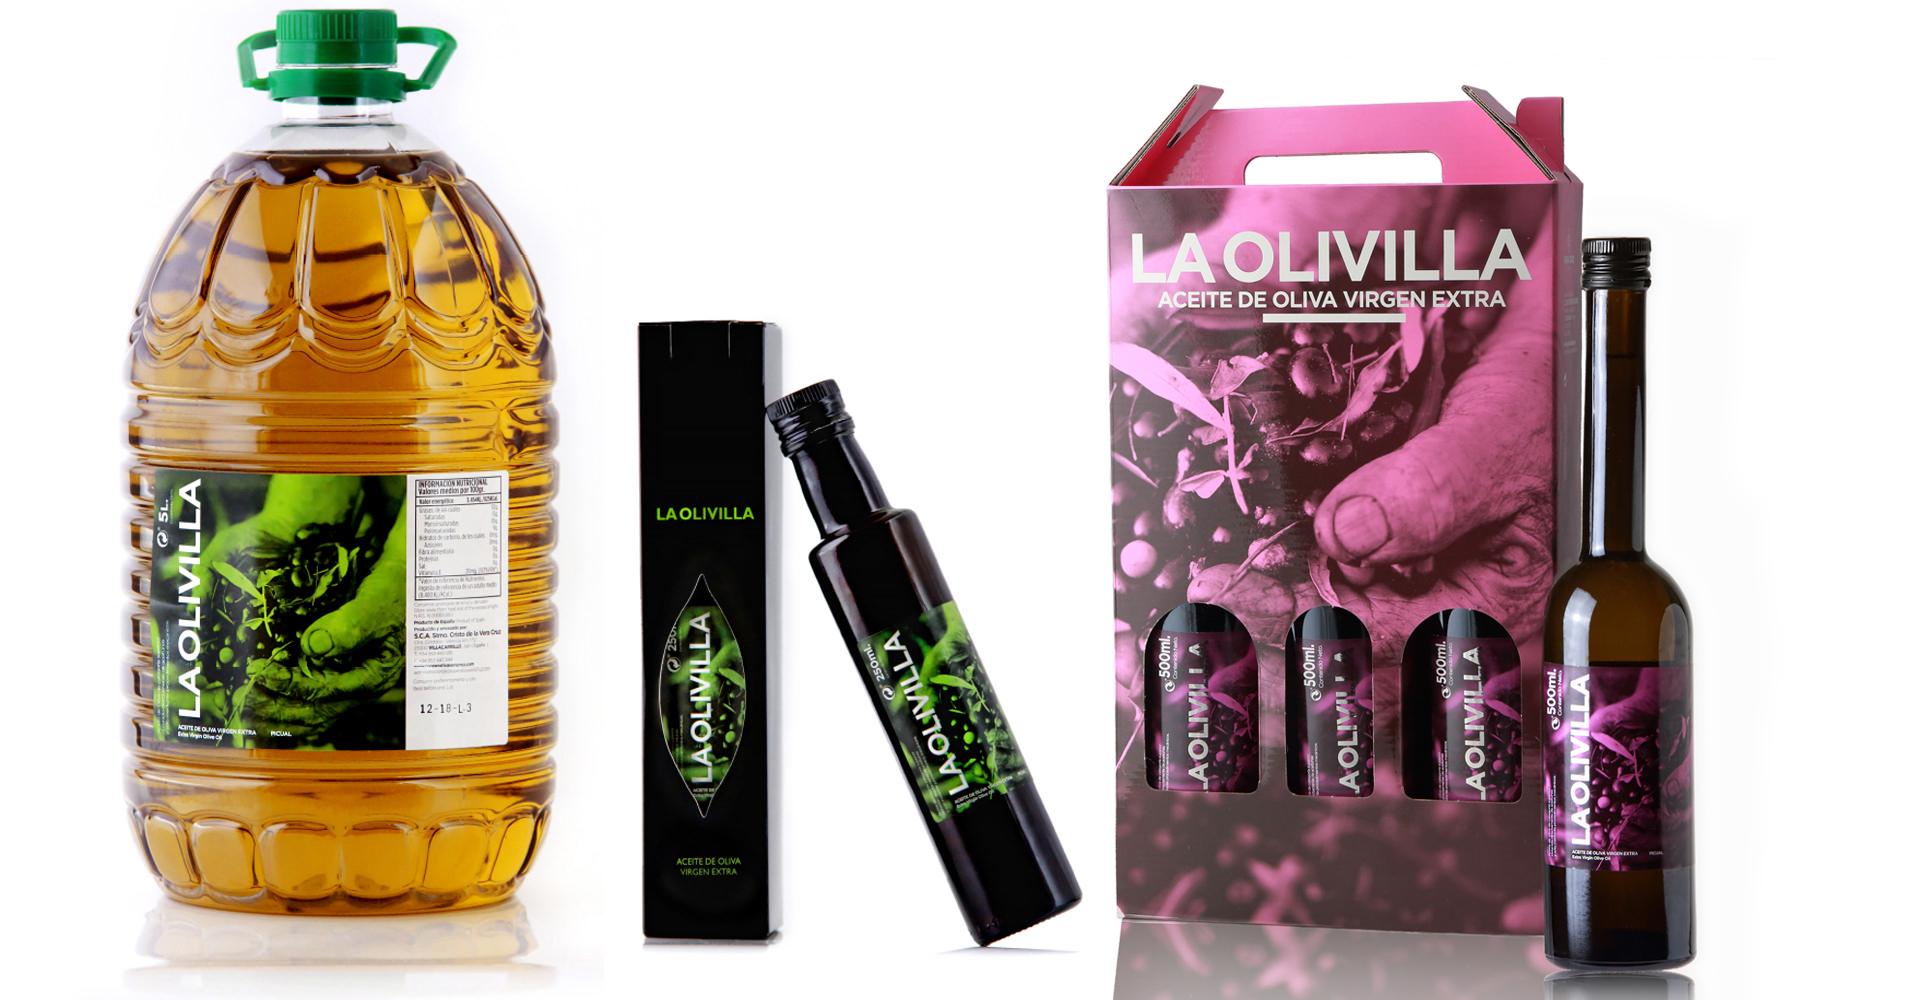 aceites de oliva LA OLIVILLA de Villacarrillo